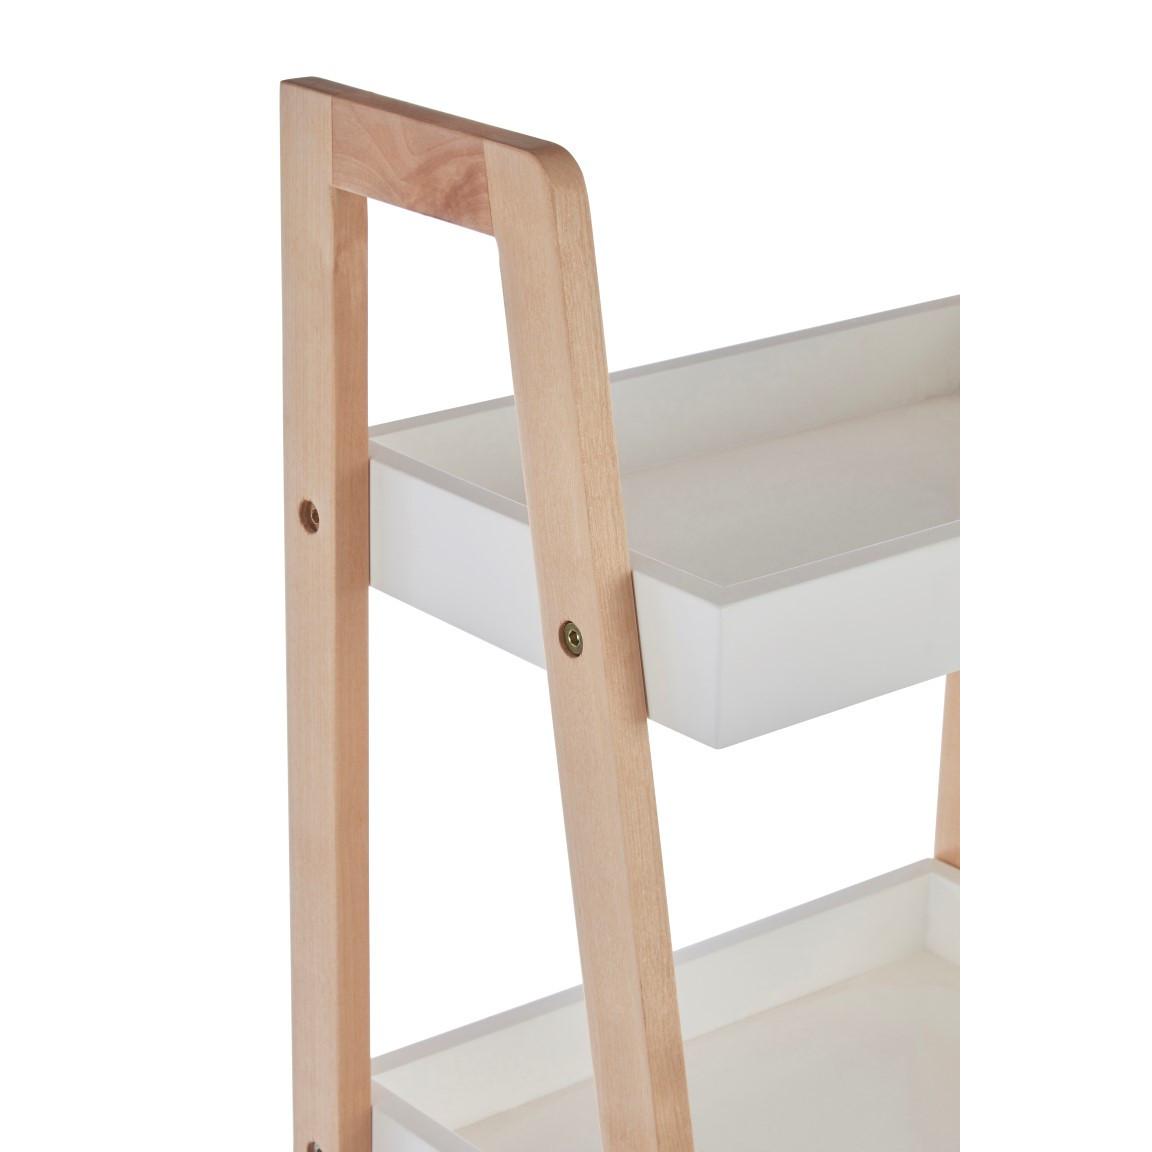 4 Tier Bathroom Shelf Birch Wood + MDF | White